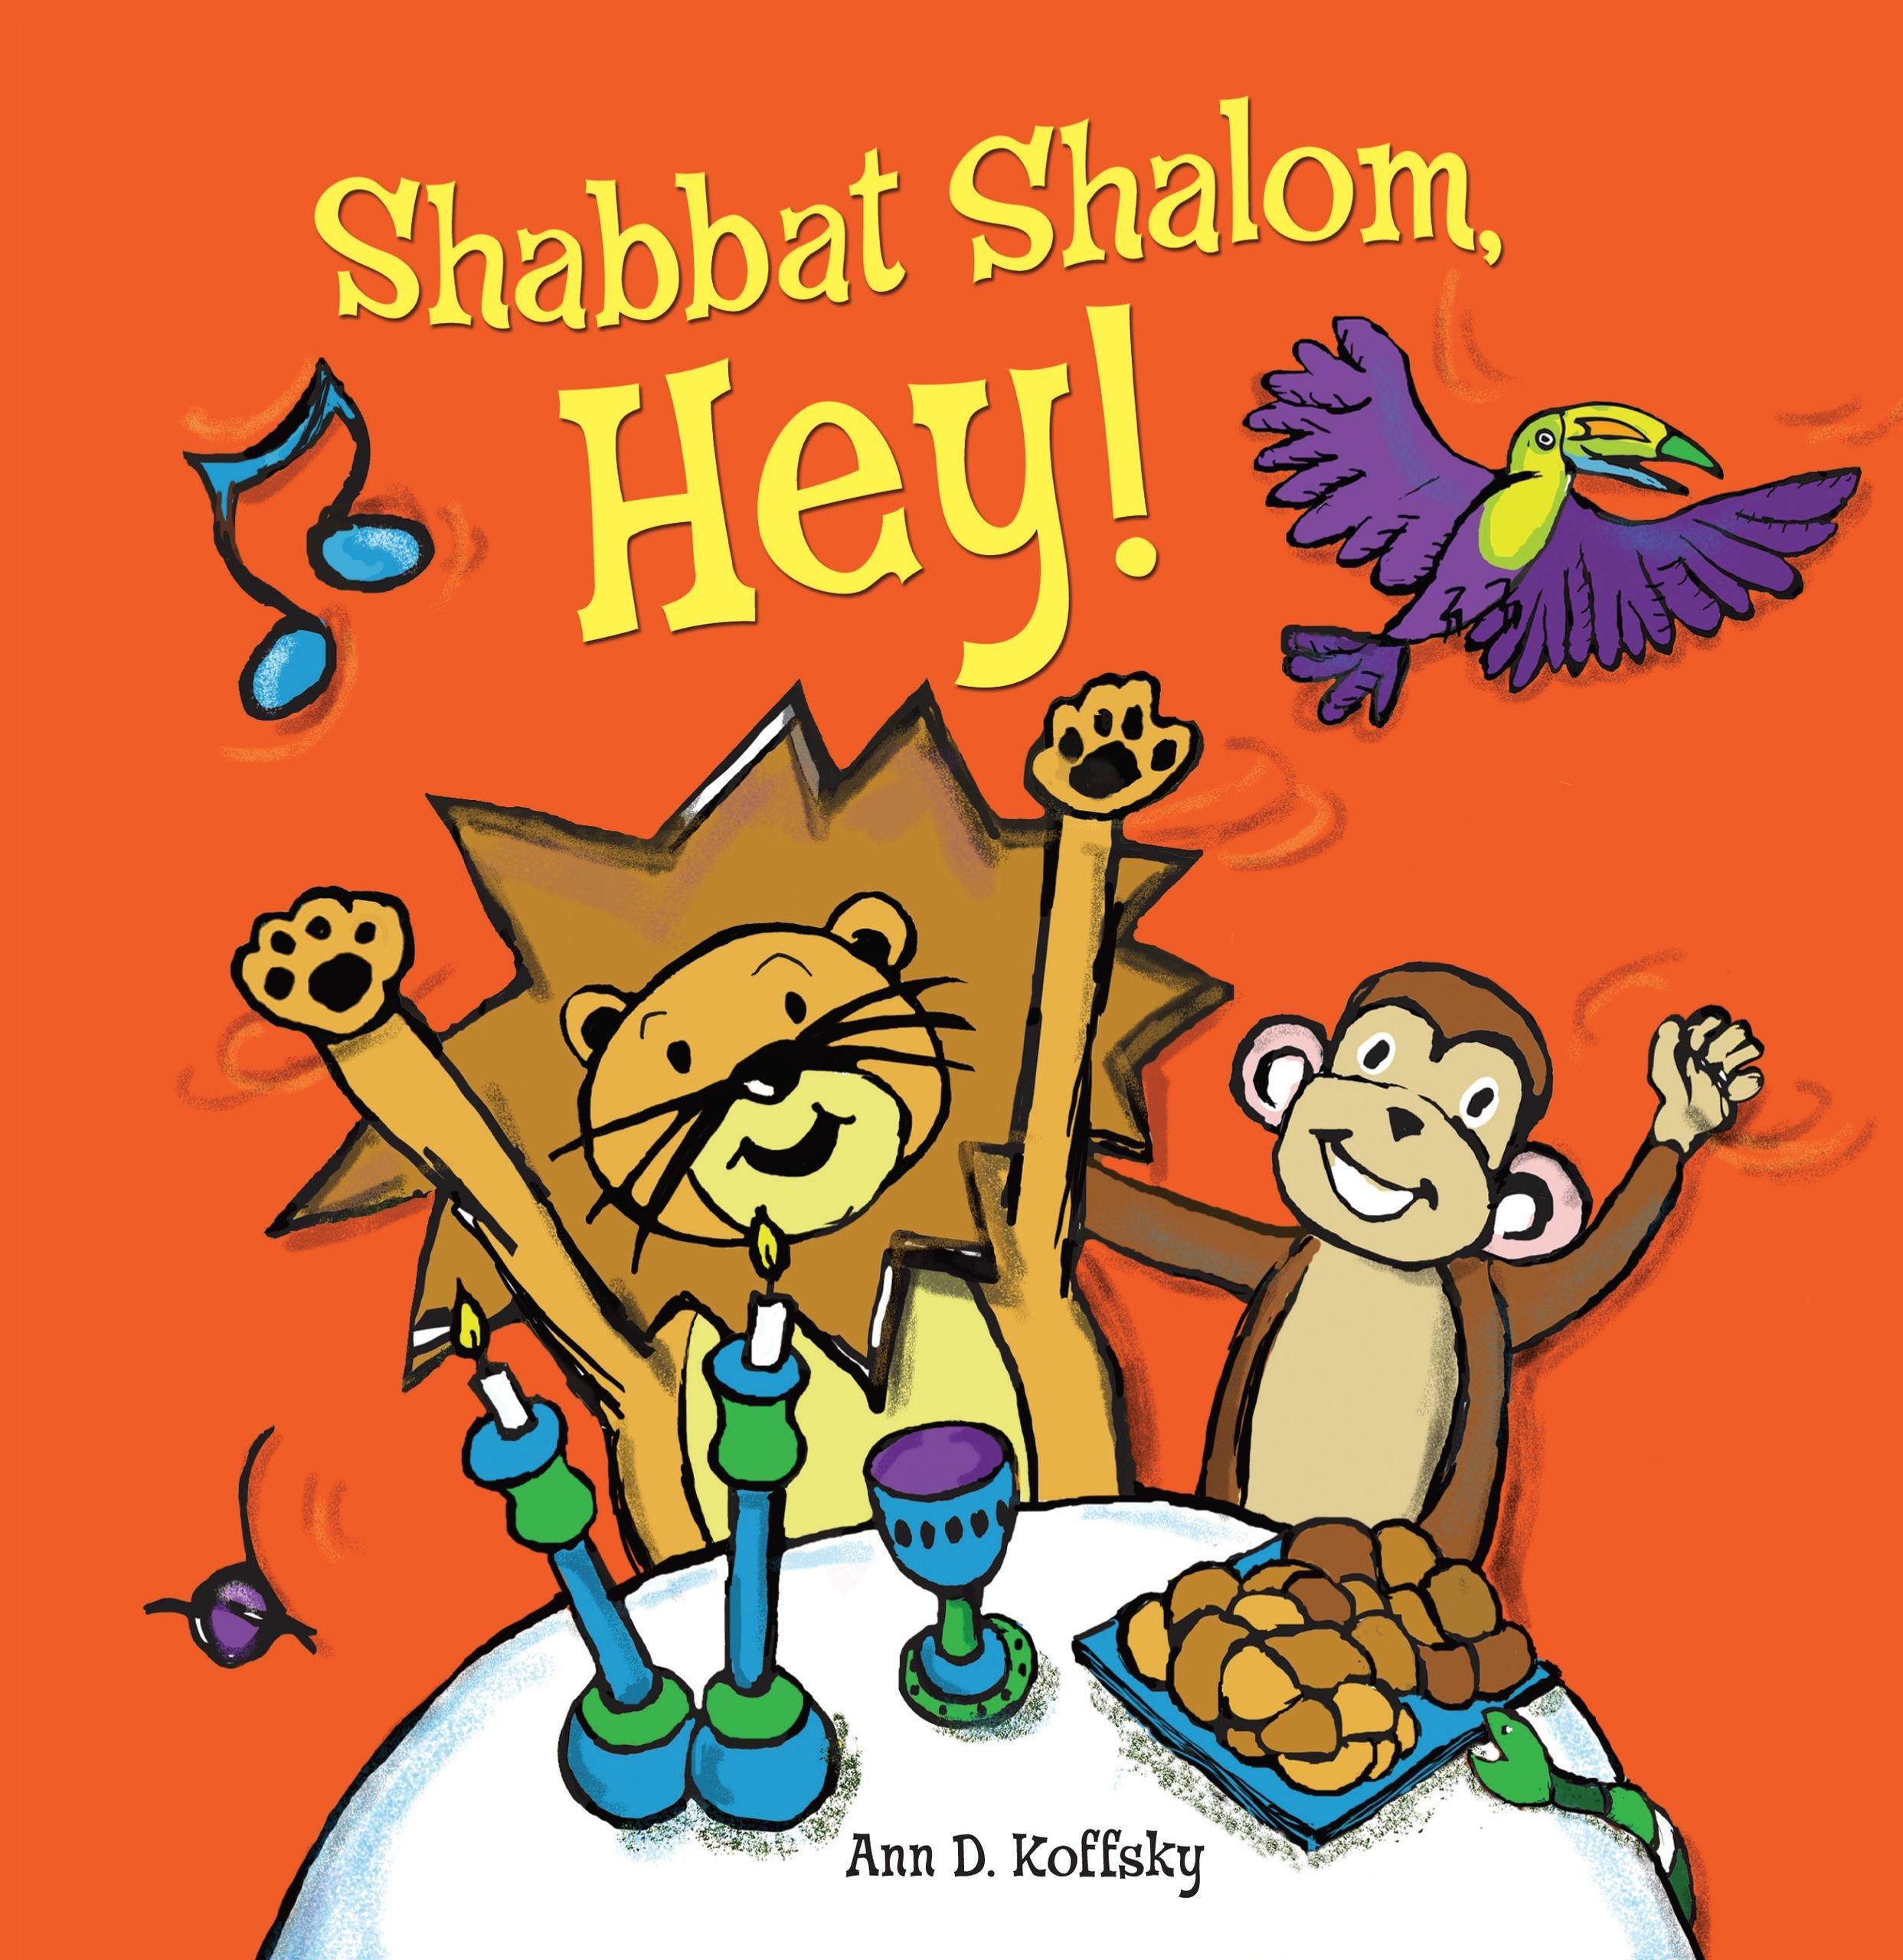 Shabbat Shalom, Hey!: Amazon.es: Ann Koffsky: Libros en idiomas extranjeros